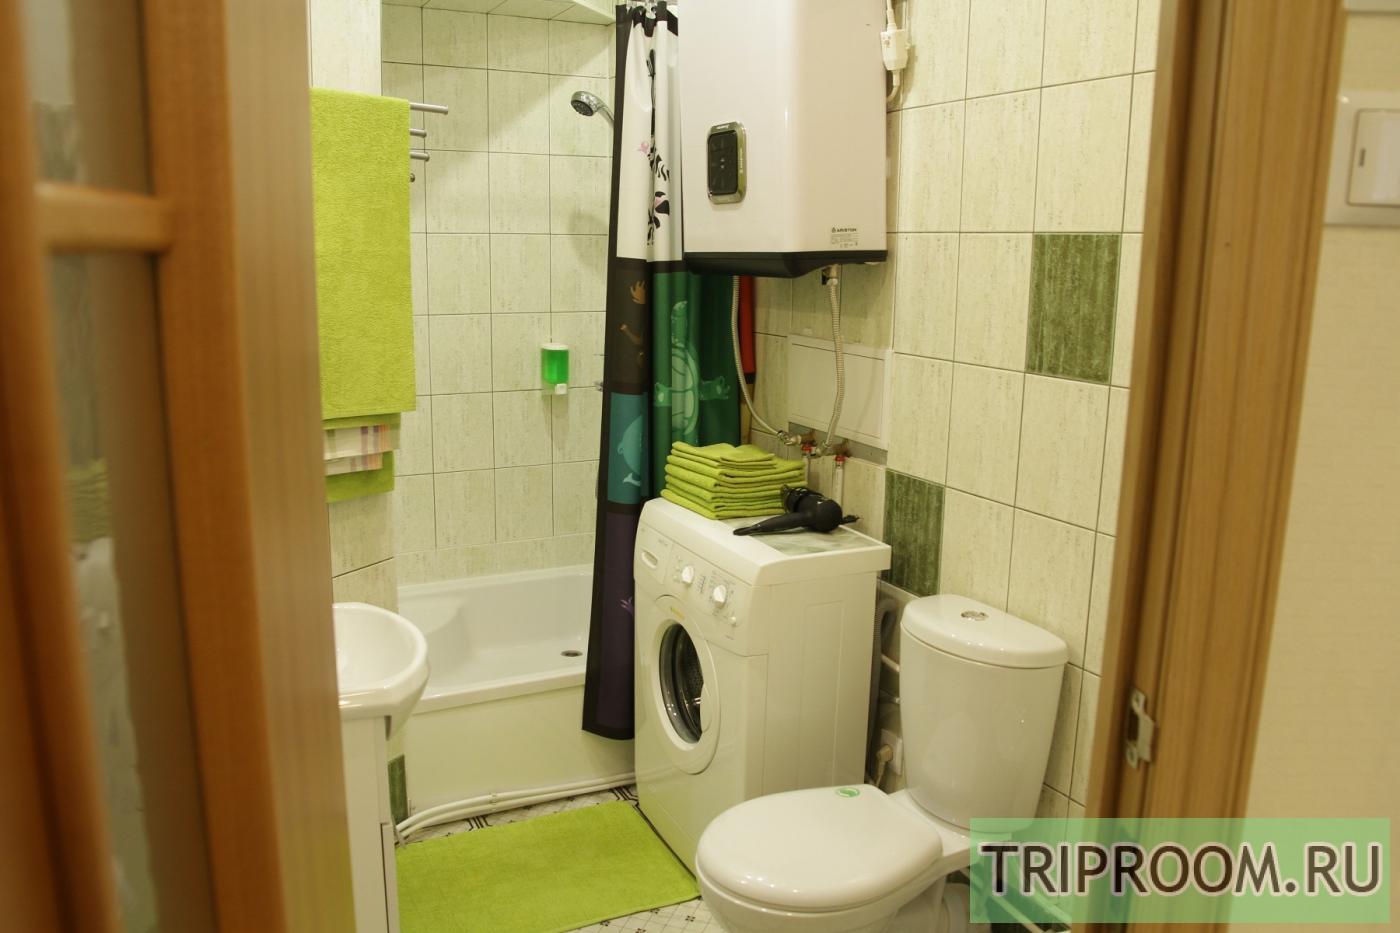 2-комнатная квартира посуточно (вариант № 23442), ул. Невский проспект, фото № 8